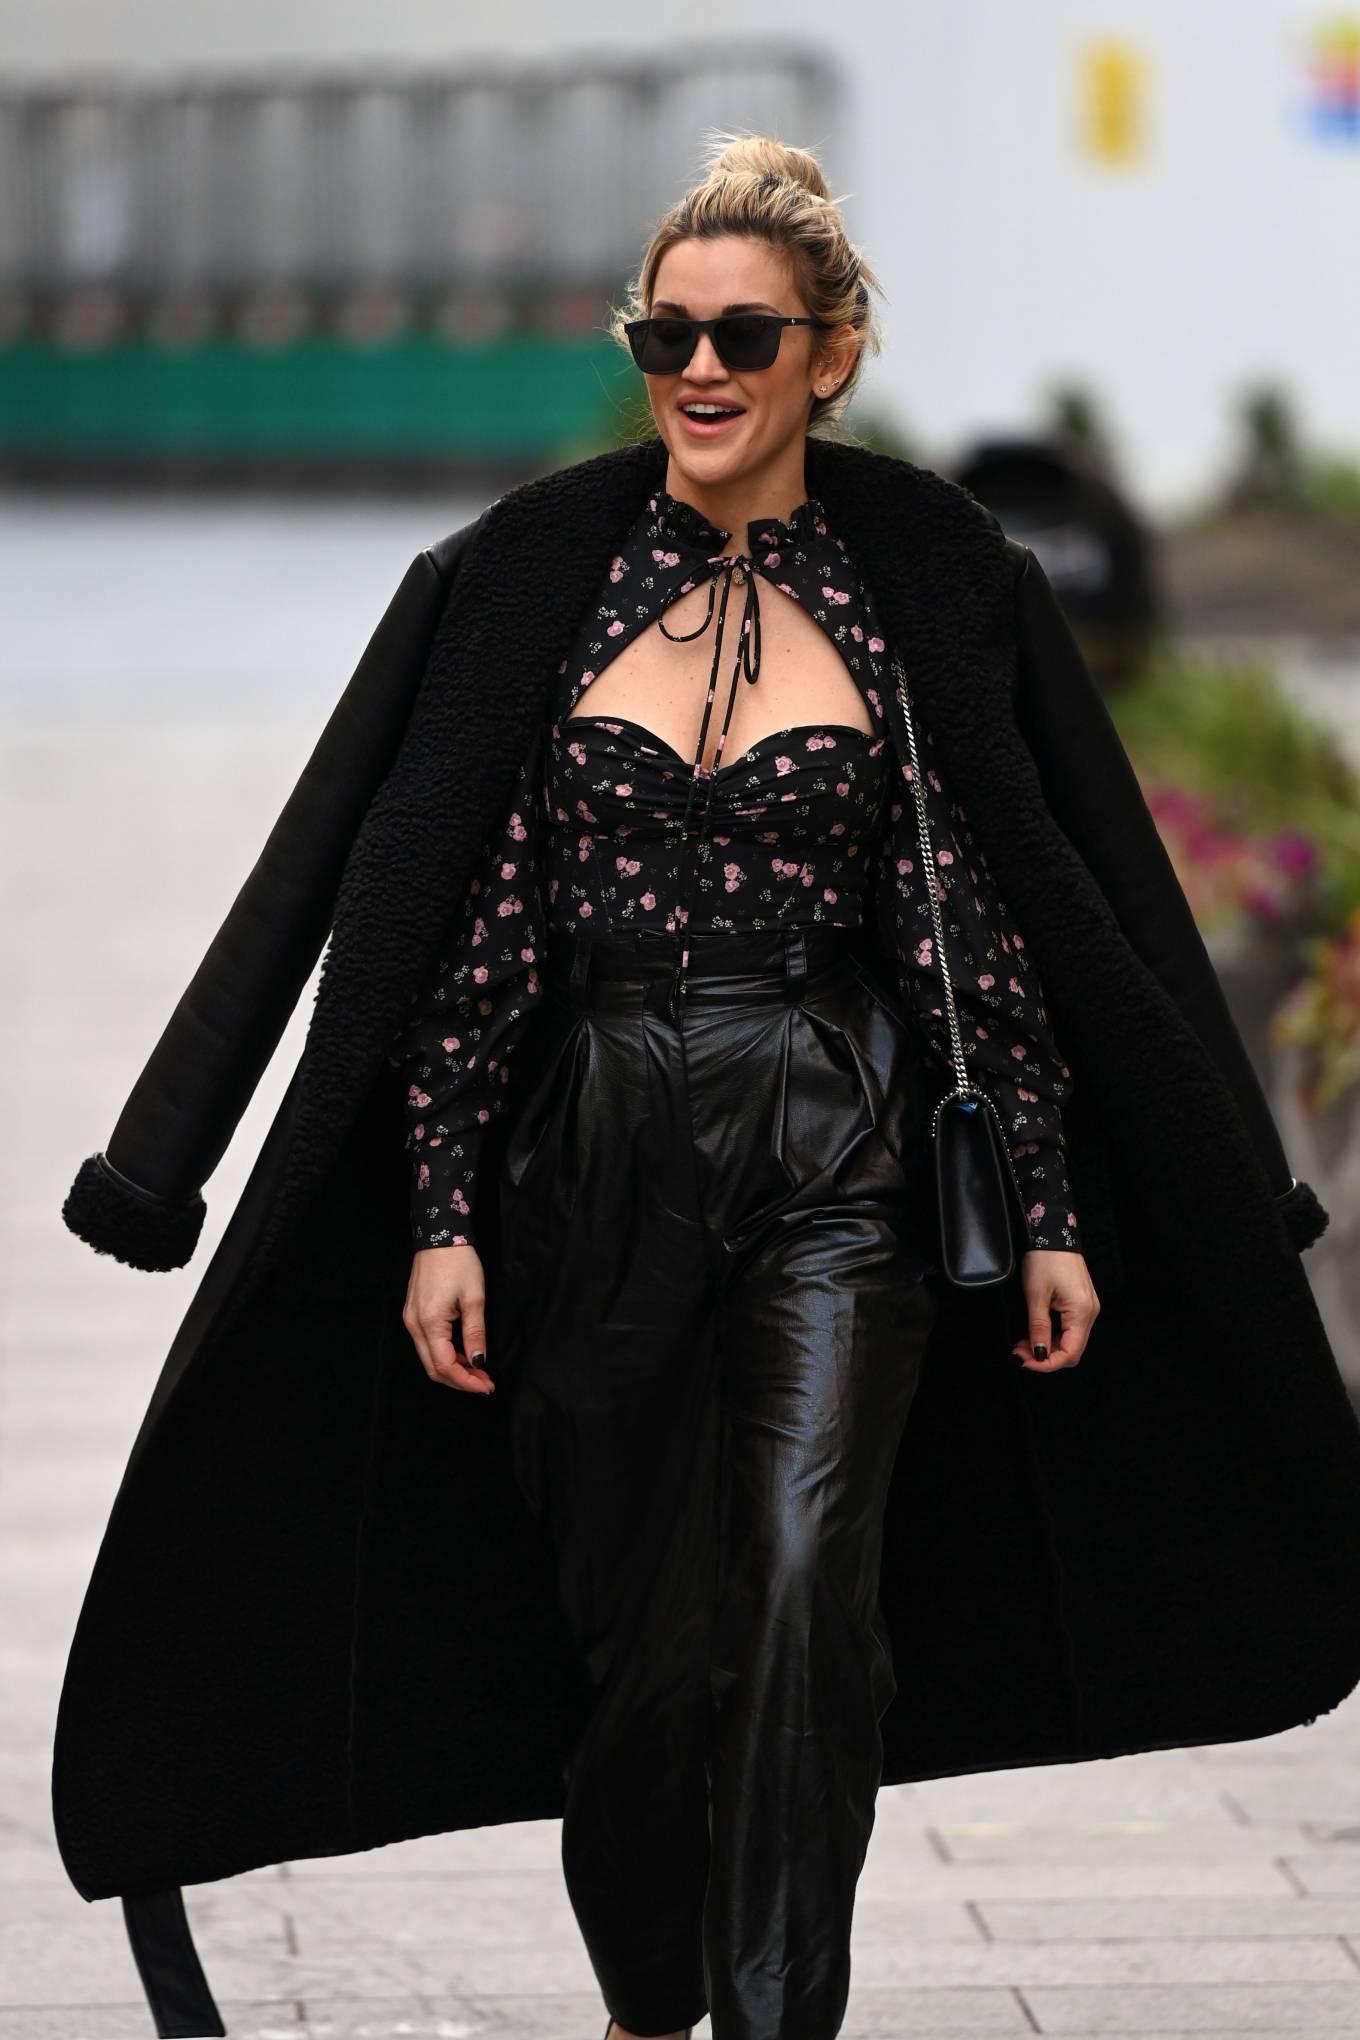 Ashley Roberts 2020 : Ashley Roberts – Looks chic leaving the Global Radio Studios in London-03